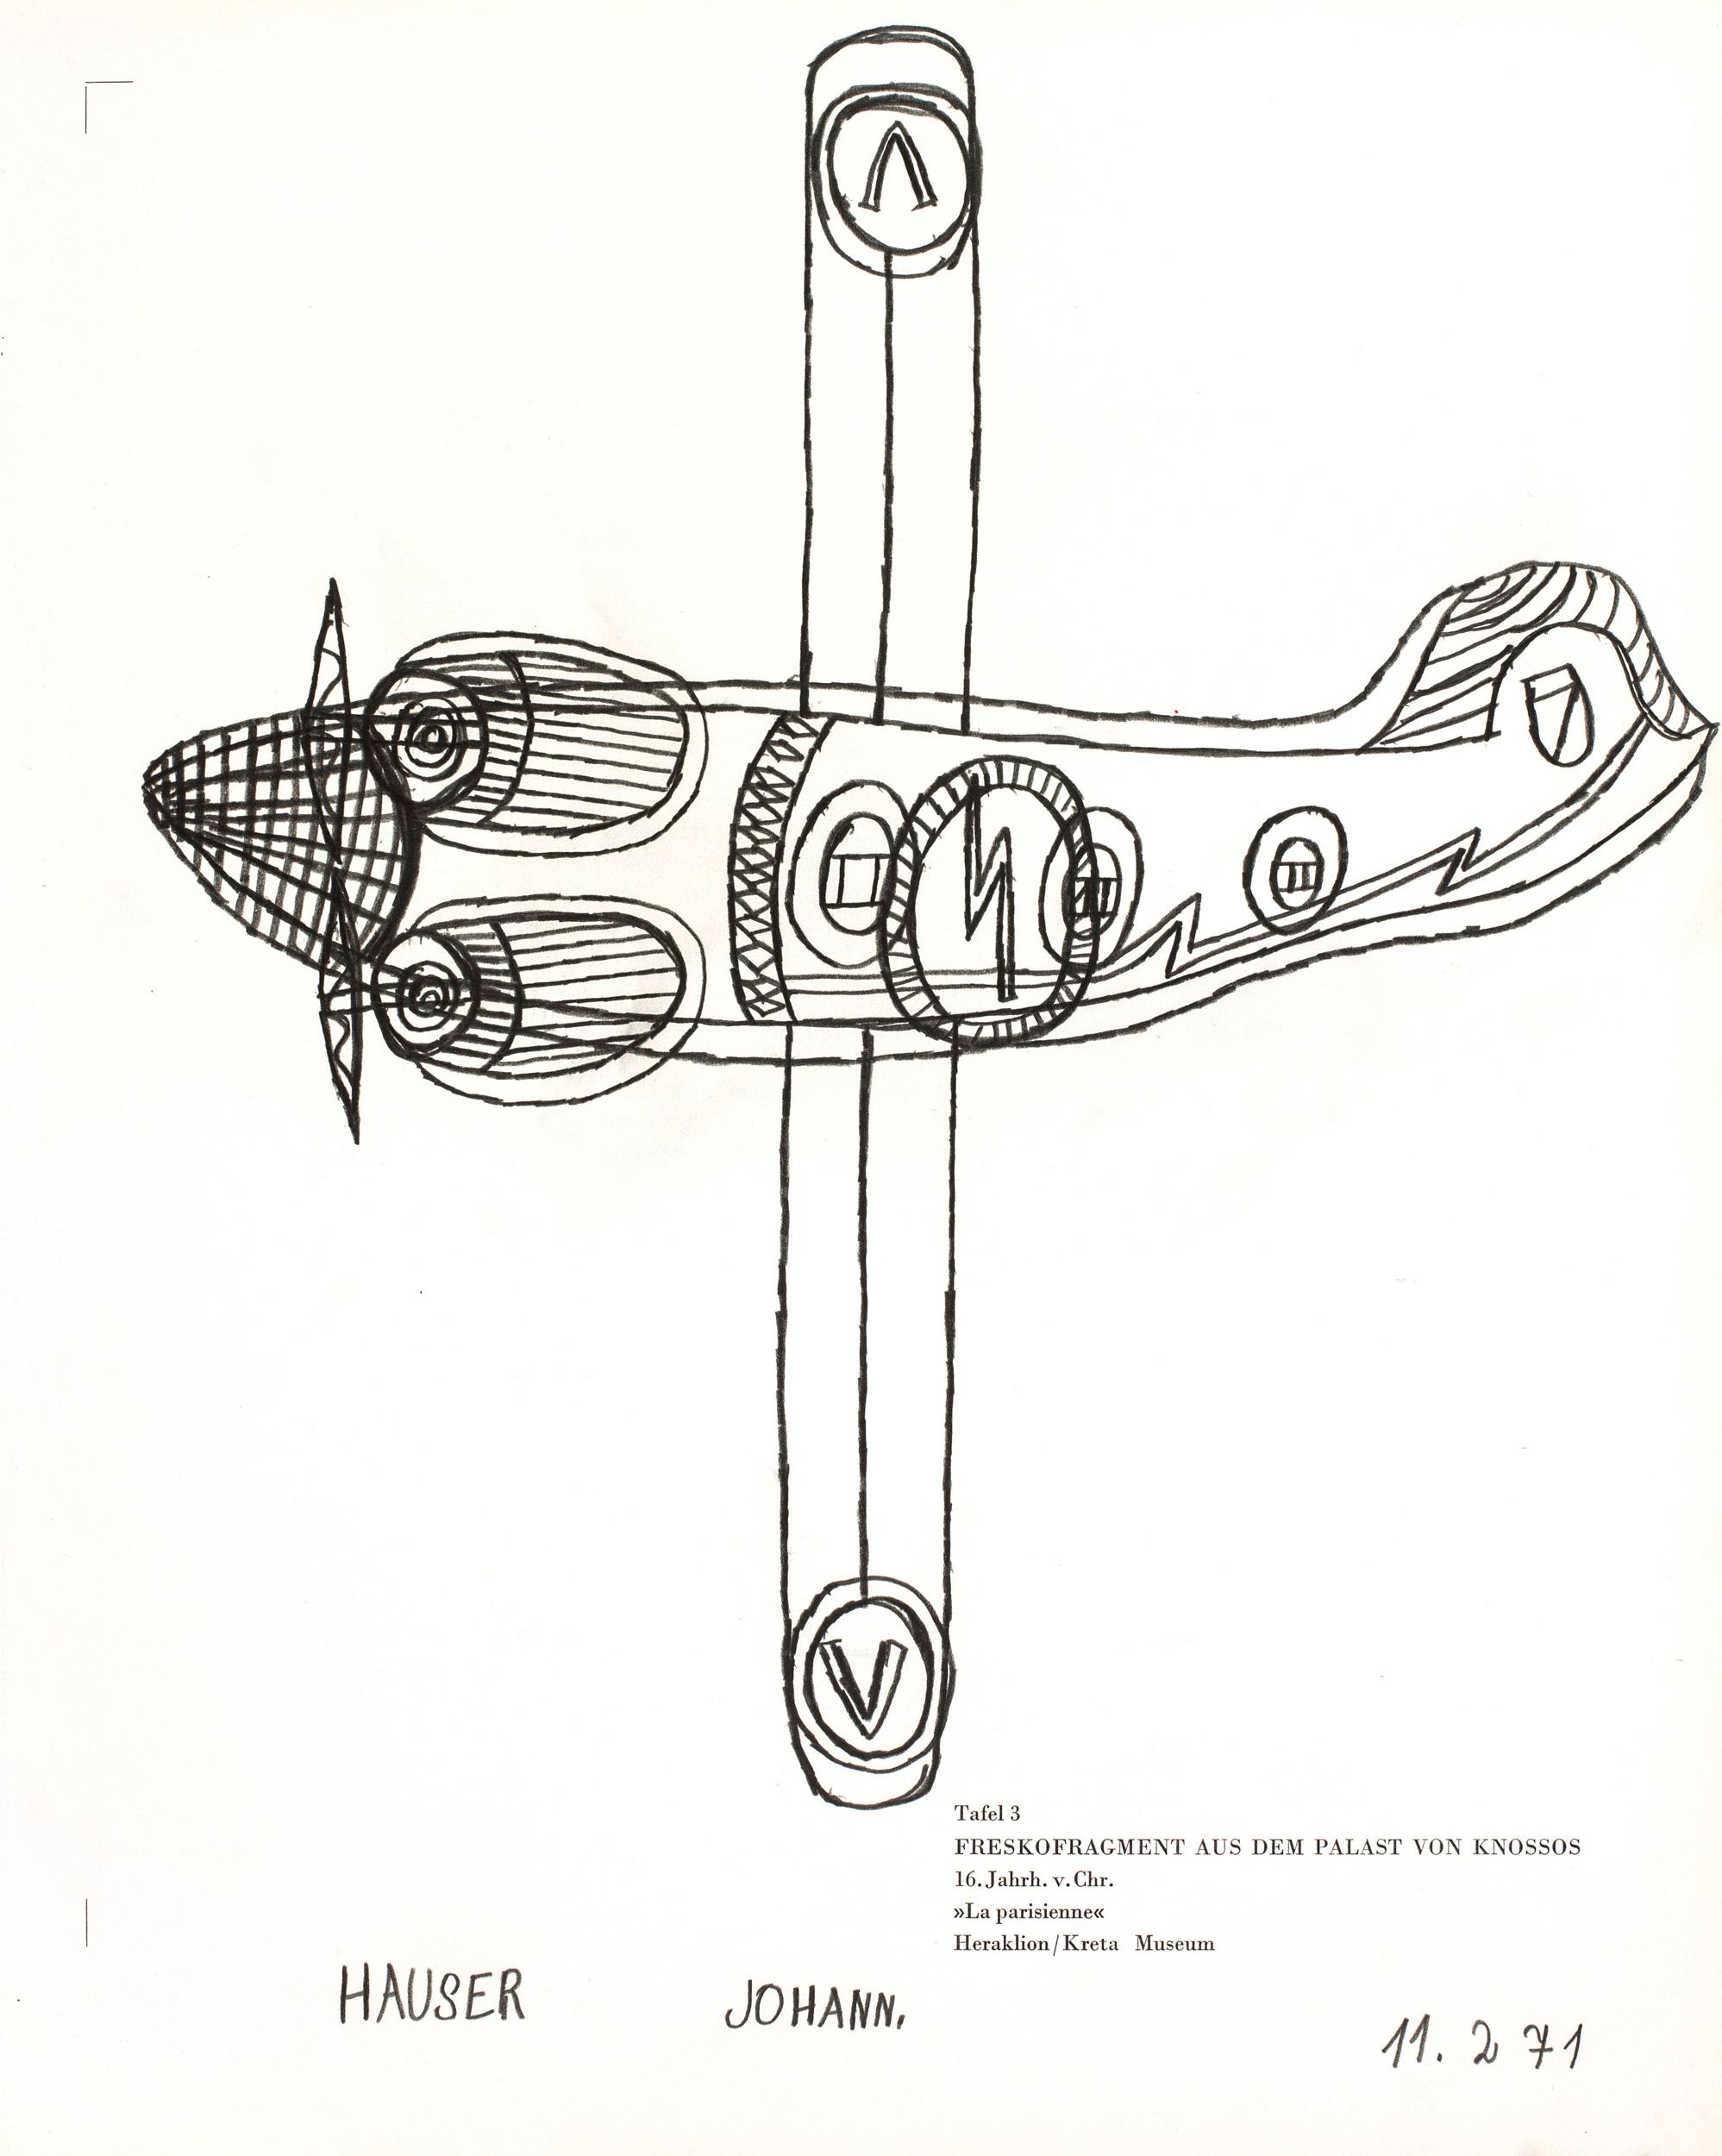 hauser johann - Flugzeug / Aeroplane